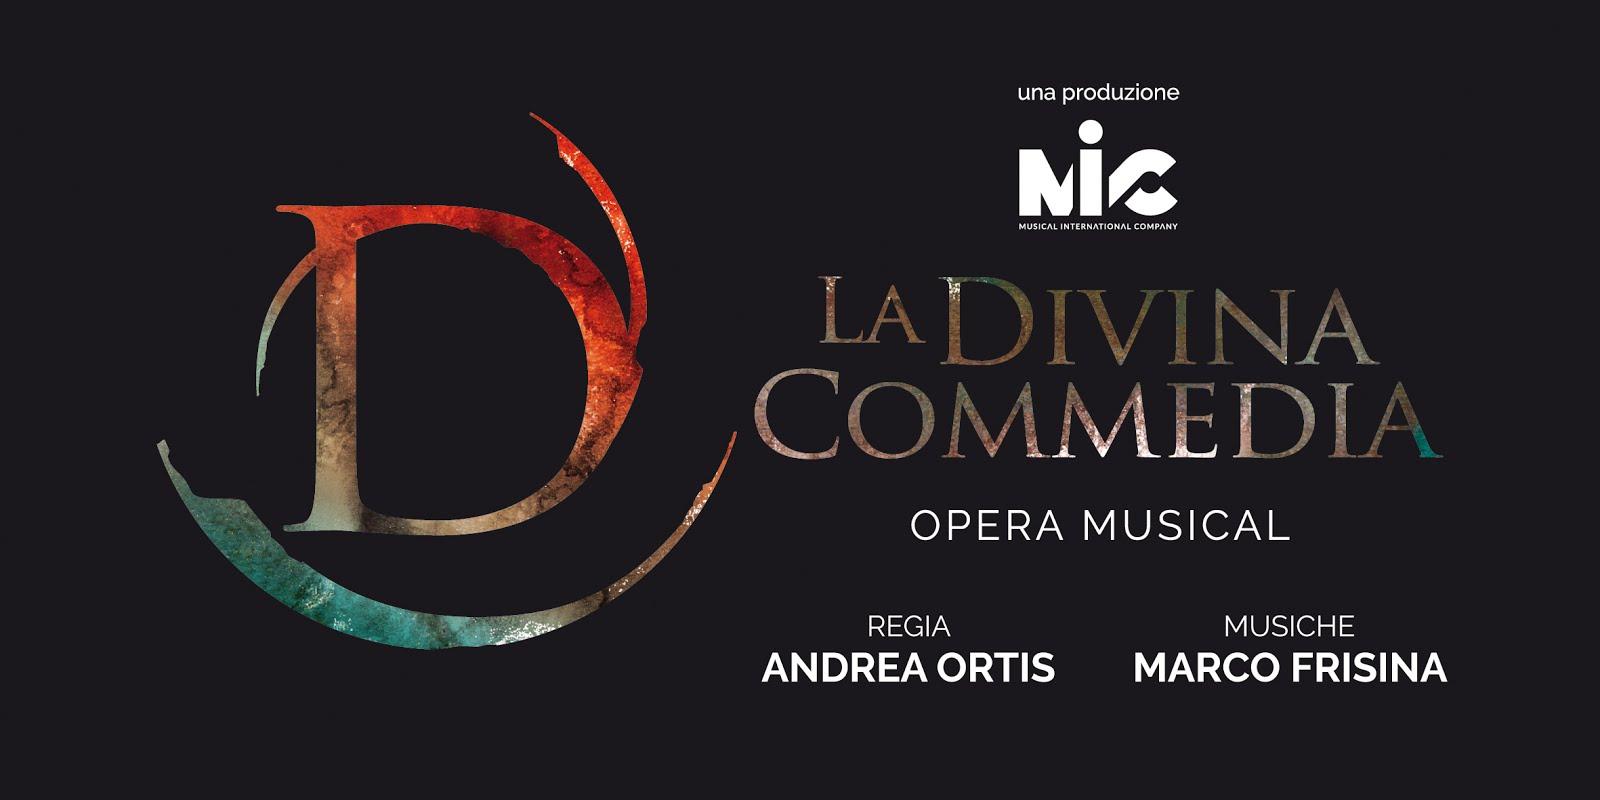 """LA DIVINA COMMEDIA OPERA MUSICAL"" regia di Andrea Ortis"